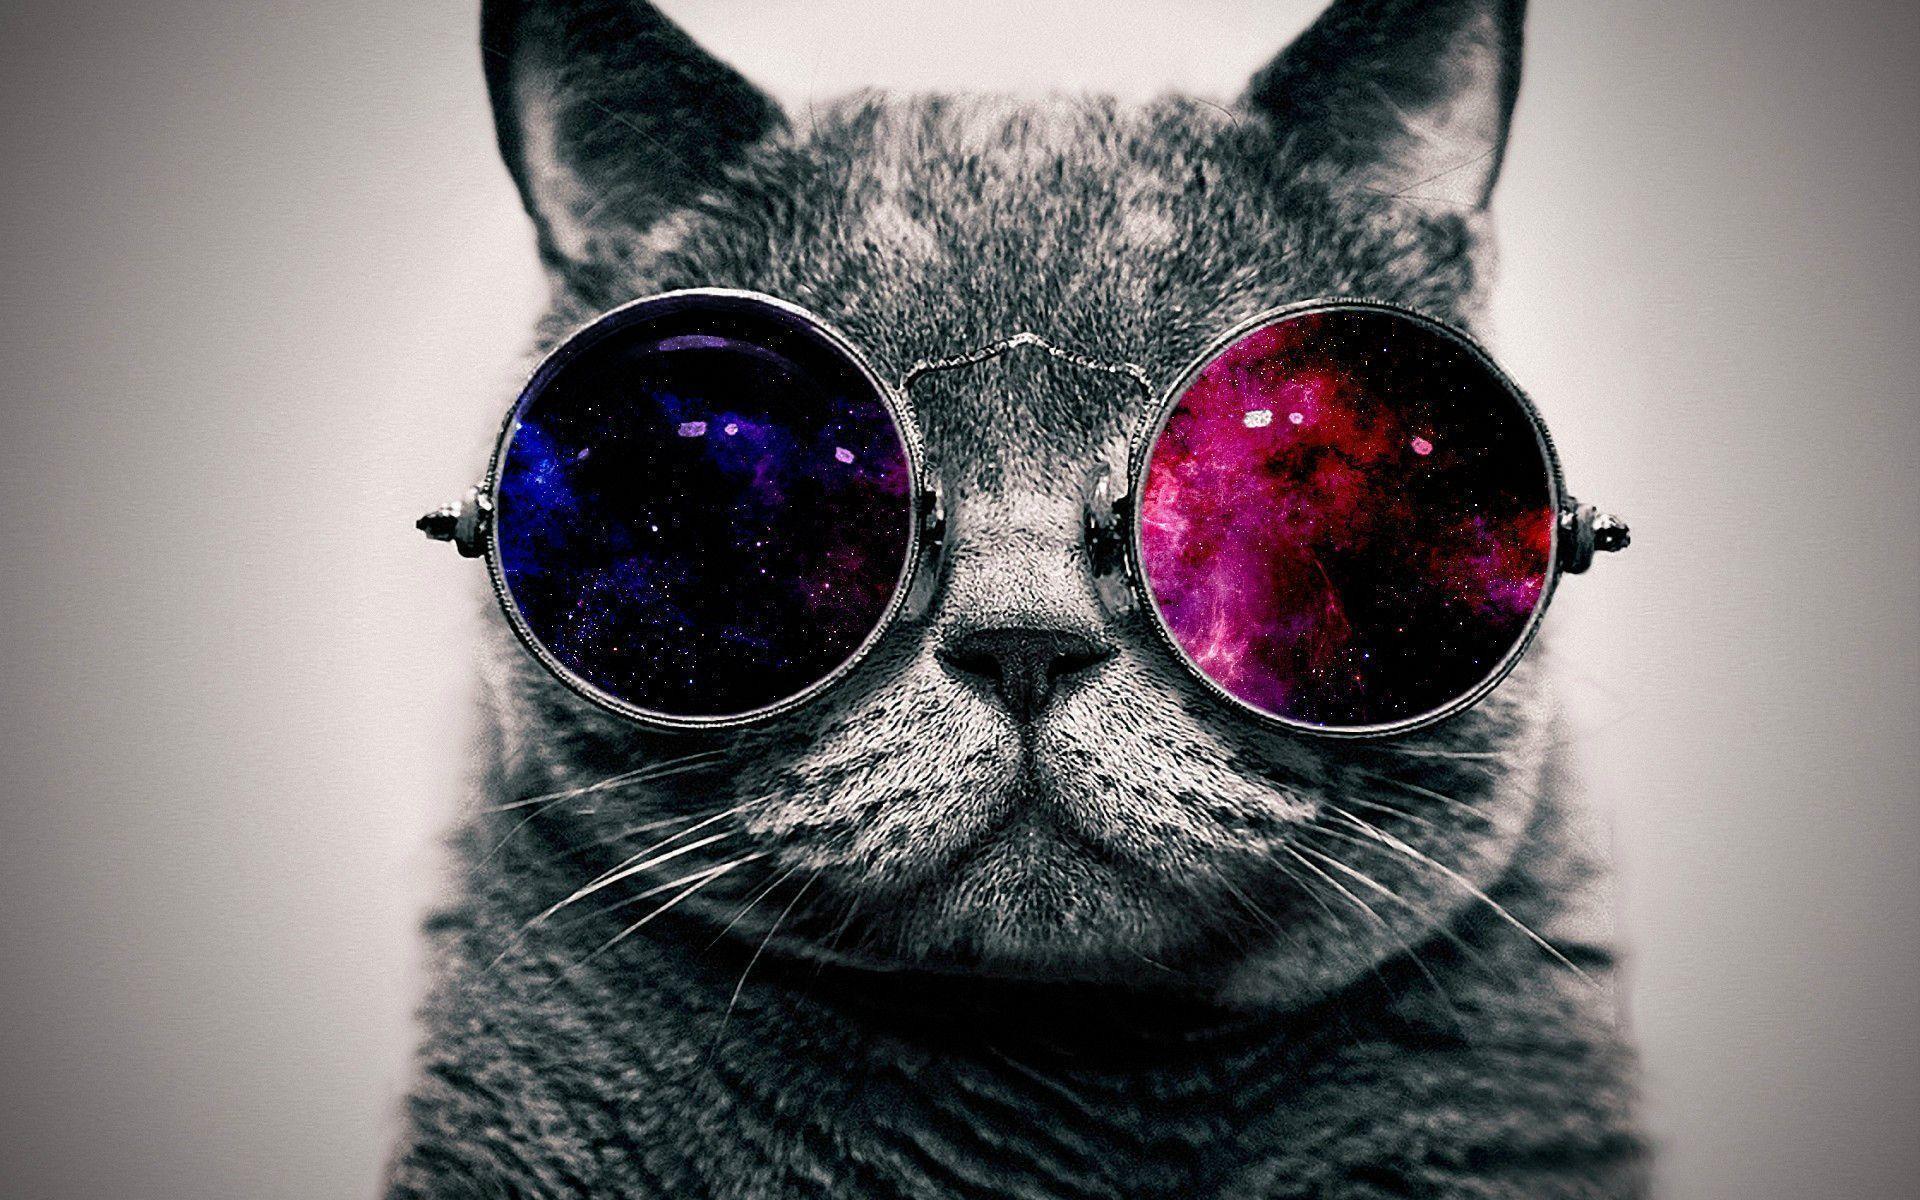 Download Cool Cat Wallpaper | Full HD Wallpapers 1920x1200